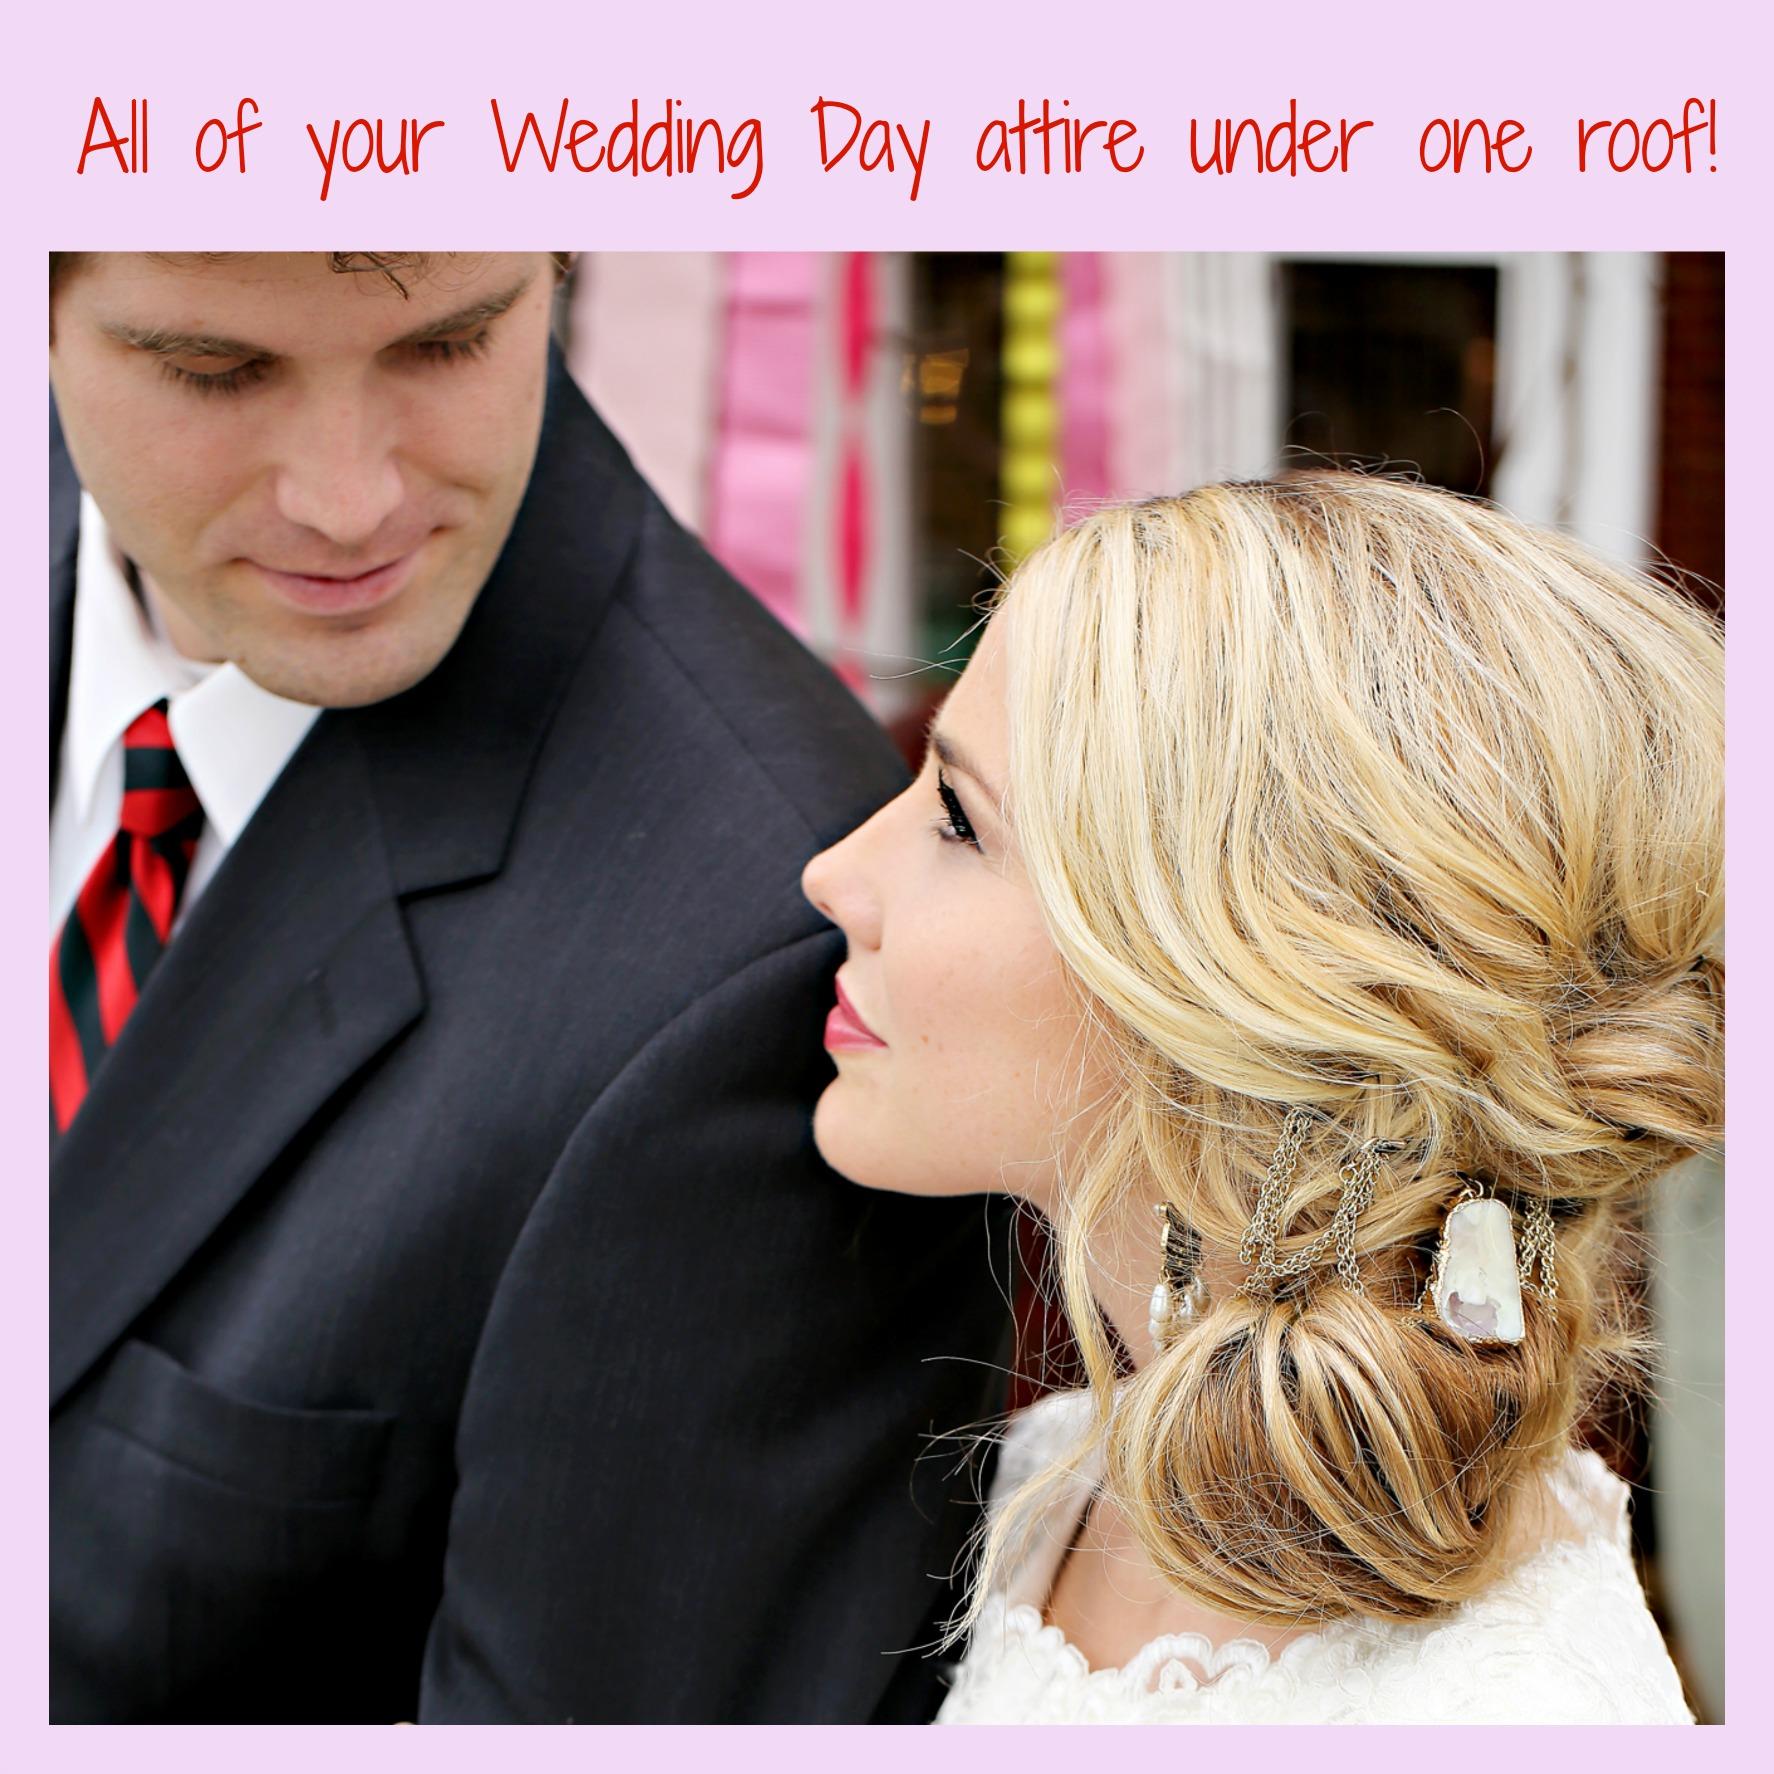 #bridalshopsinloganutah